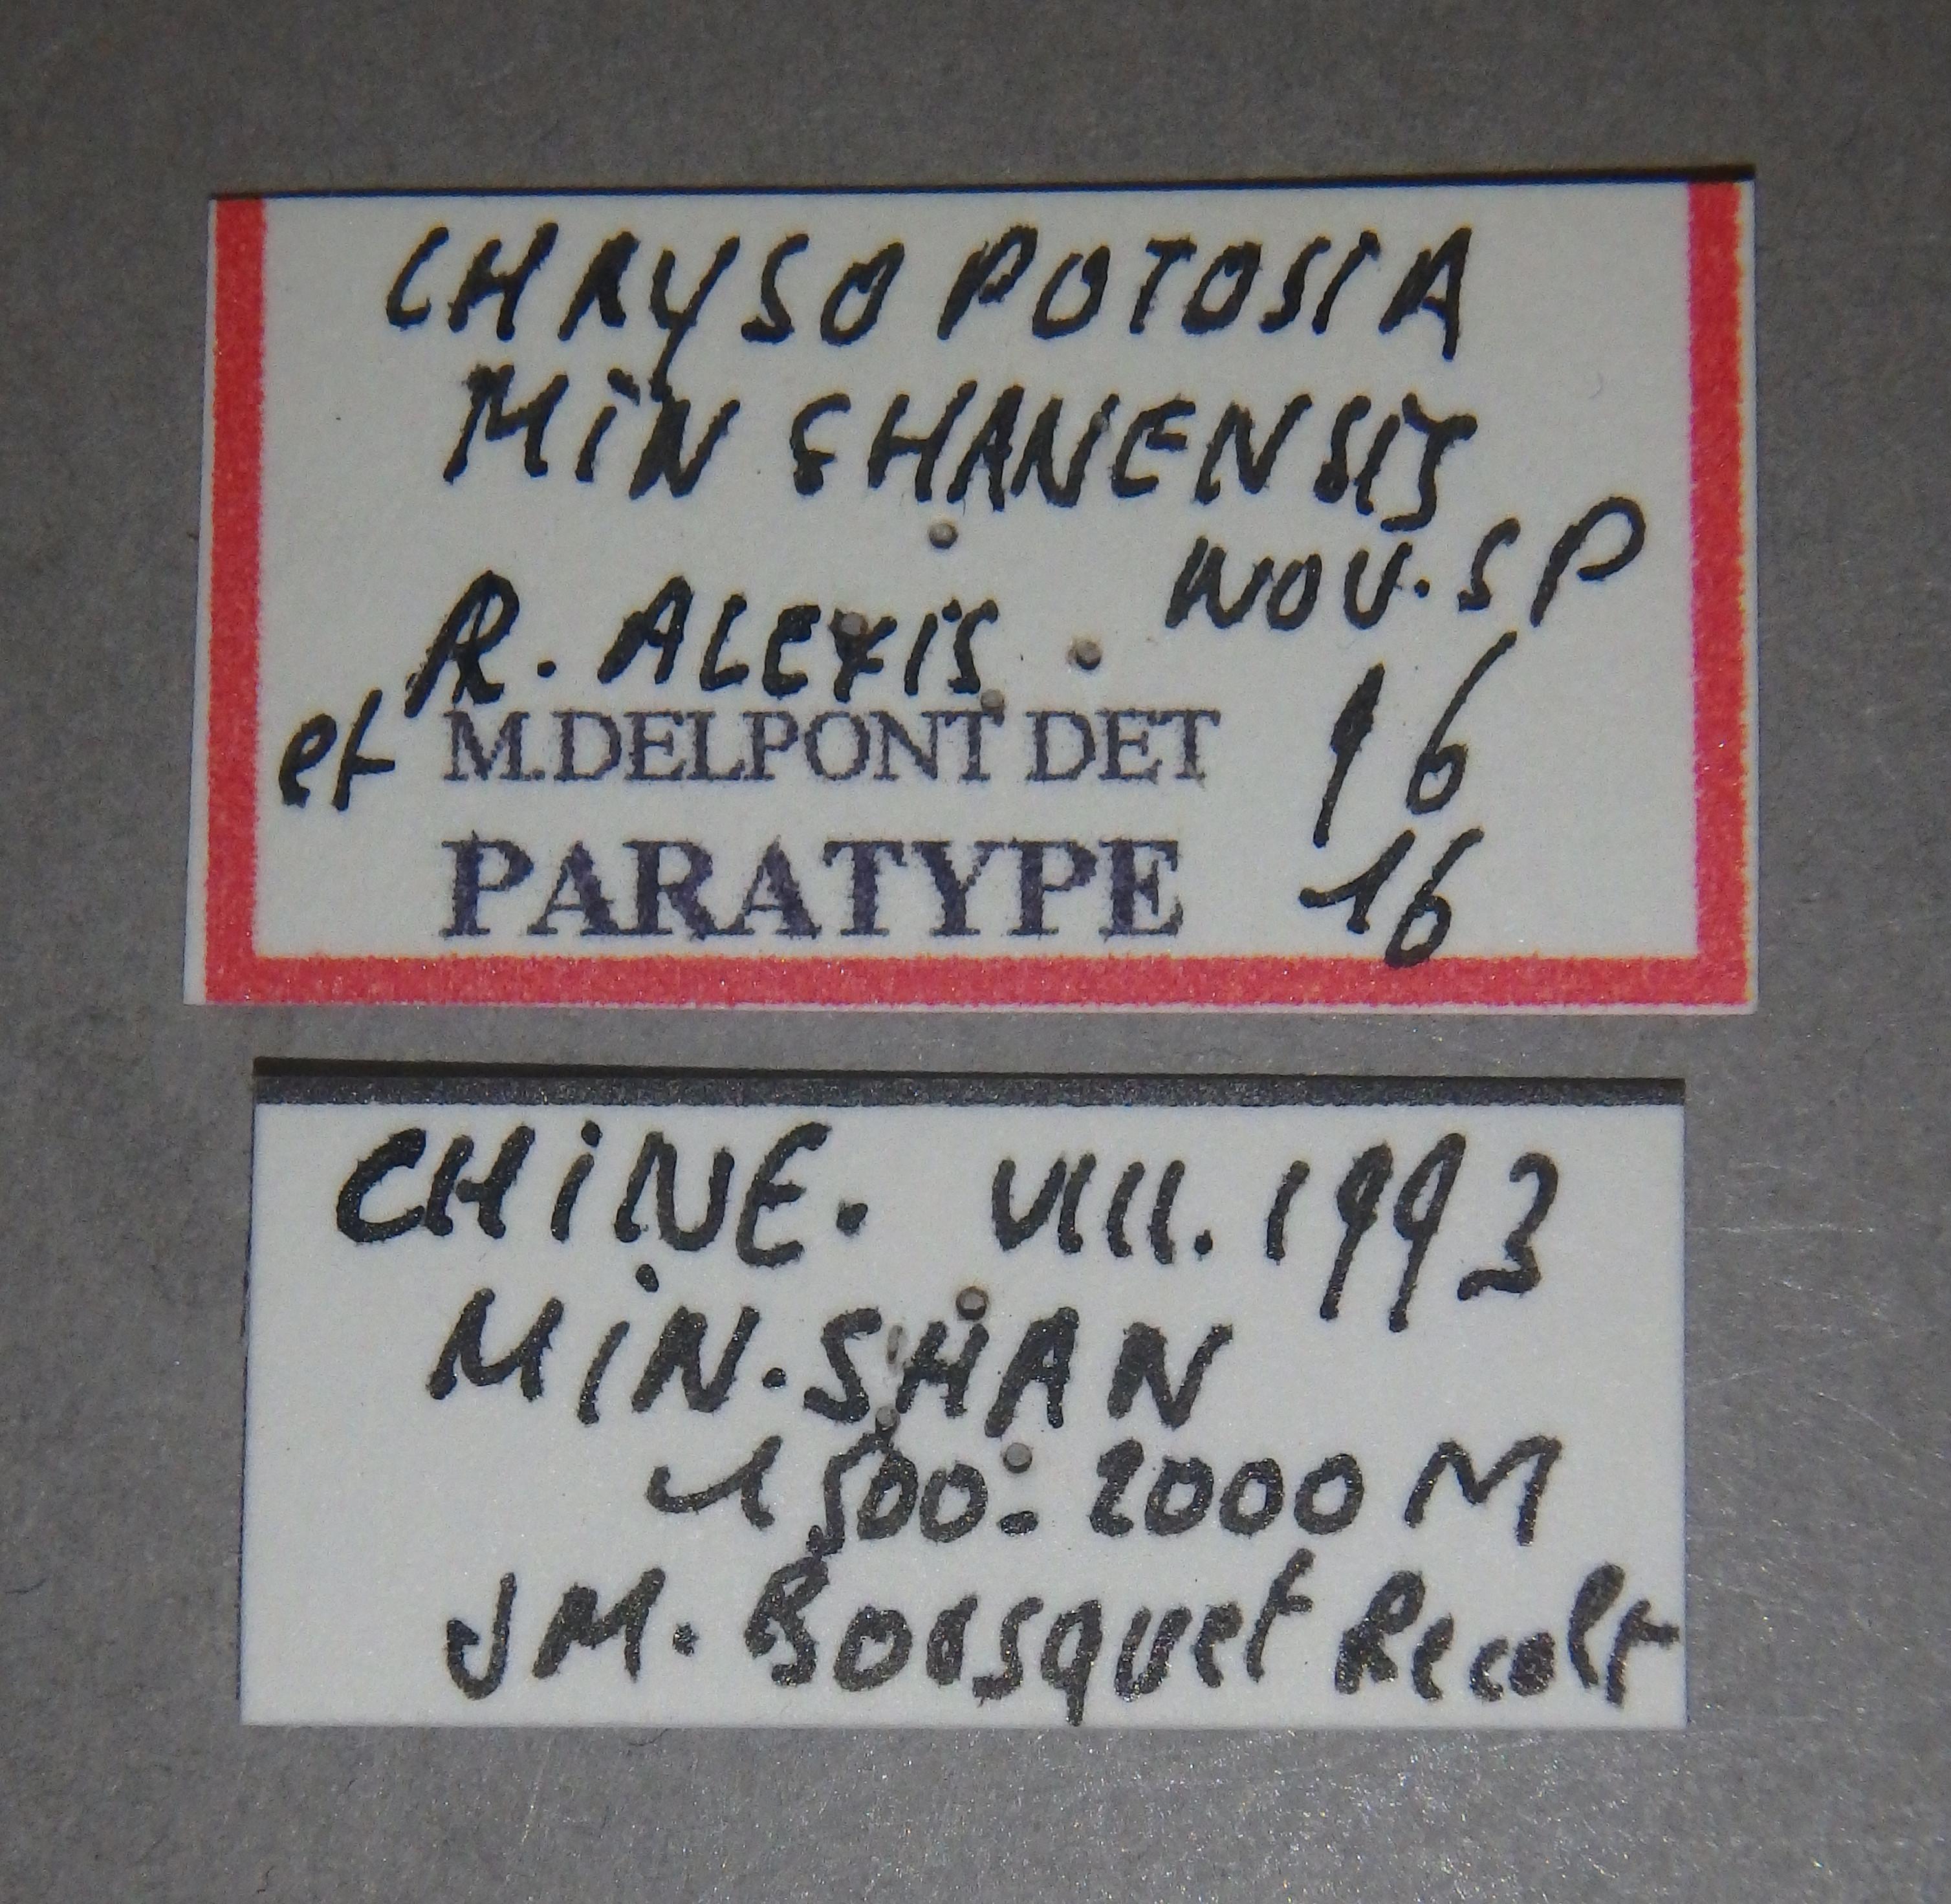 Chrysopotosia minshanensis pt2 Lb.JPG